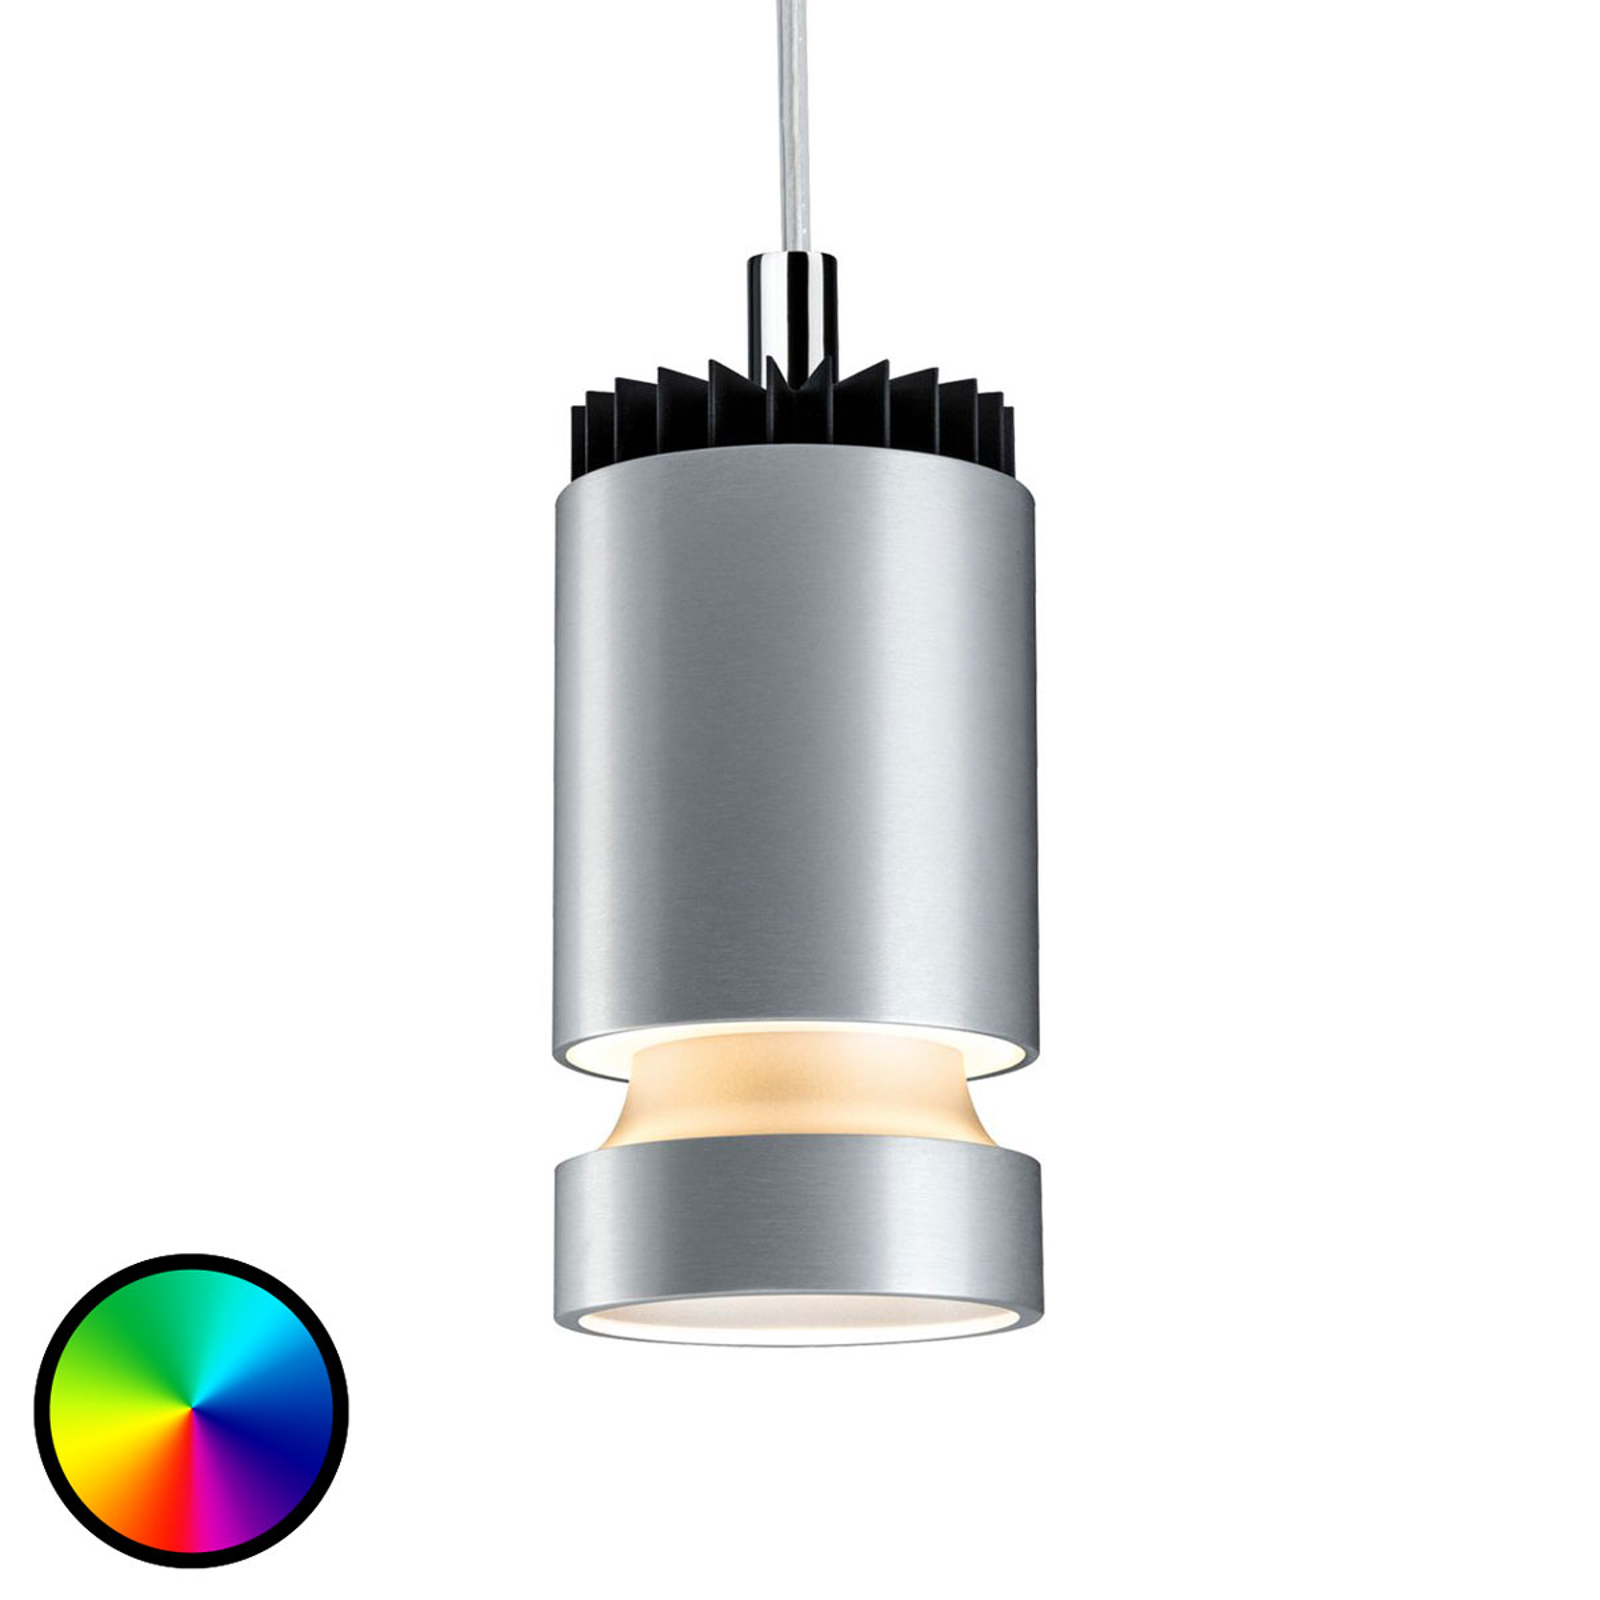 Paulmann VariLine lampa wisząca LED Shine, 2700K